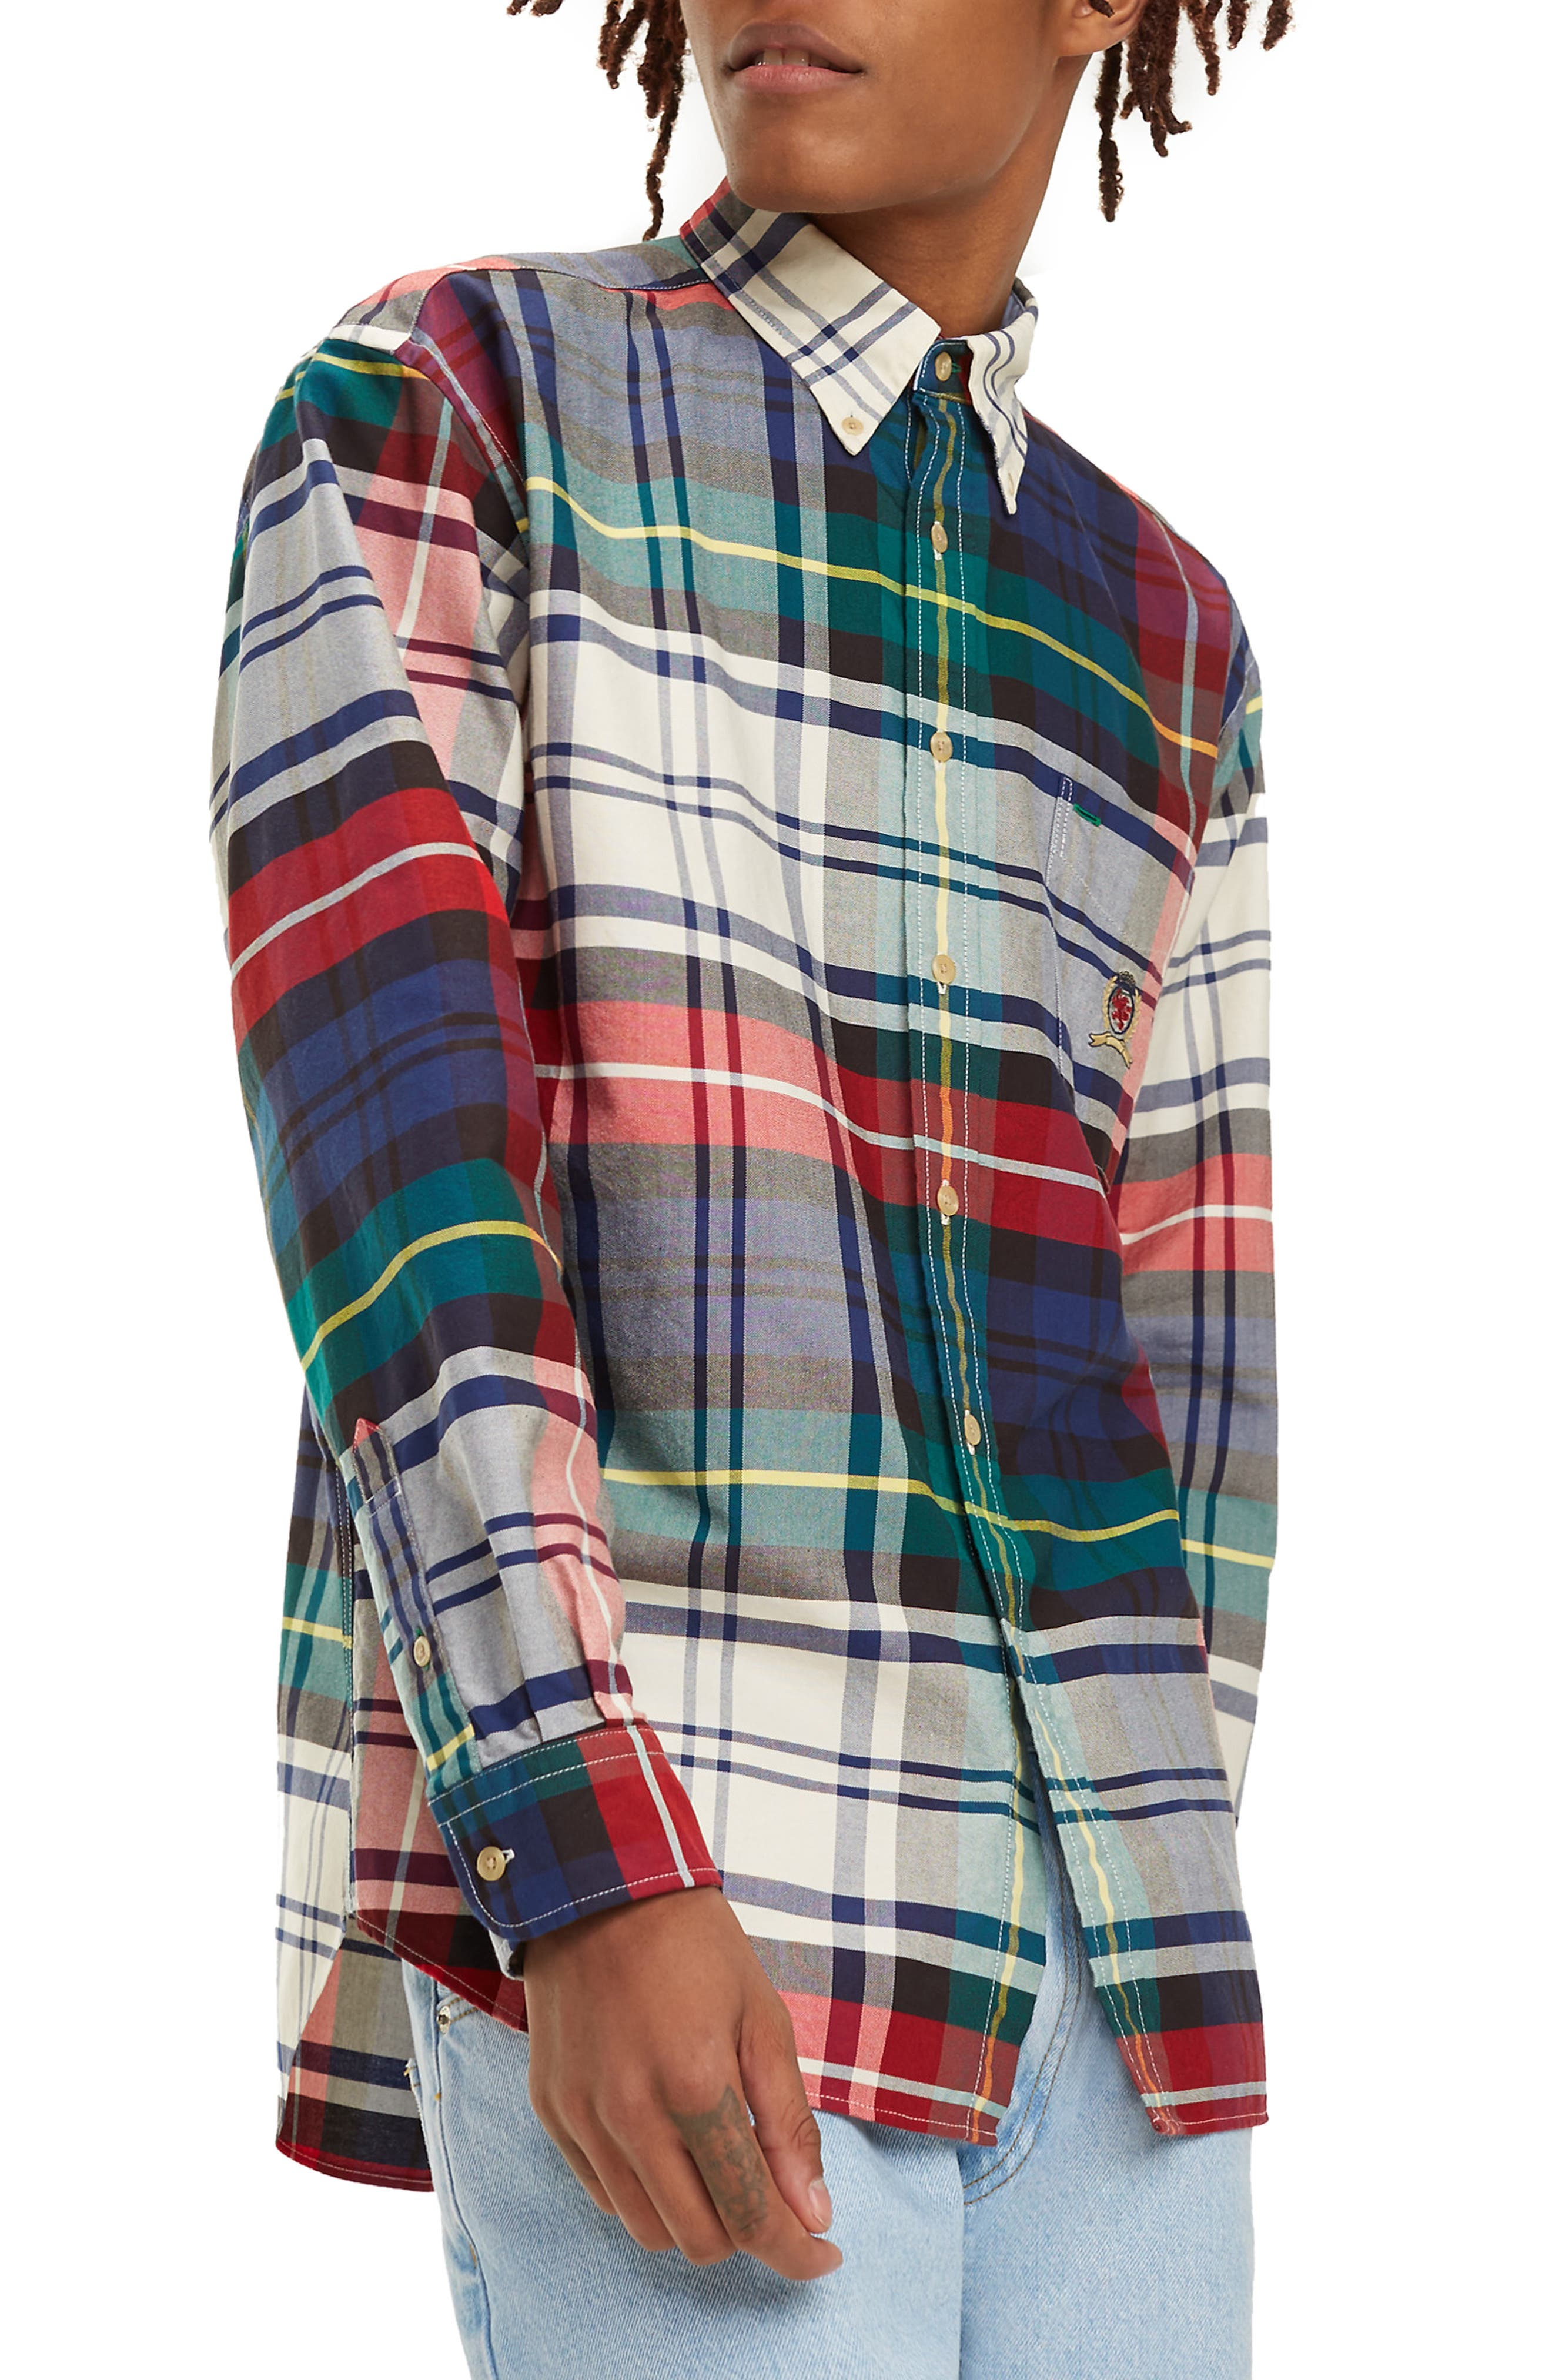 TJM Plaid Crest Sport Shirt,                         Main,                         color, CHECK DARK SAPPHIRE / MULTI